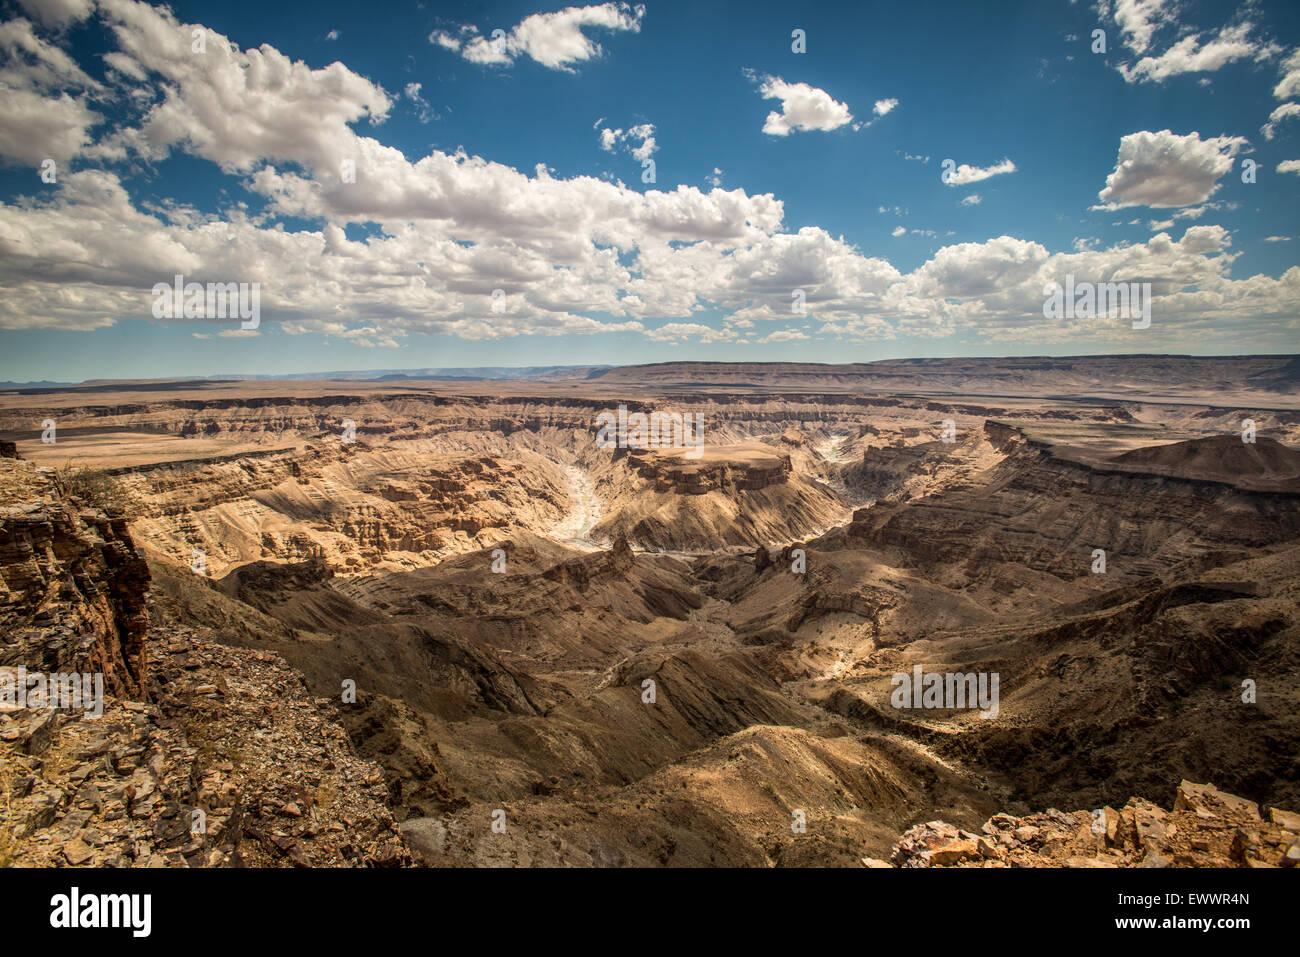 Hobas, Namibia, Africa - Fish River Canyon, el cañón más grande de África. Parte de la ǀAi-ǀAis/Richtersveld Imagen De Stock